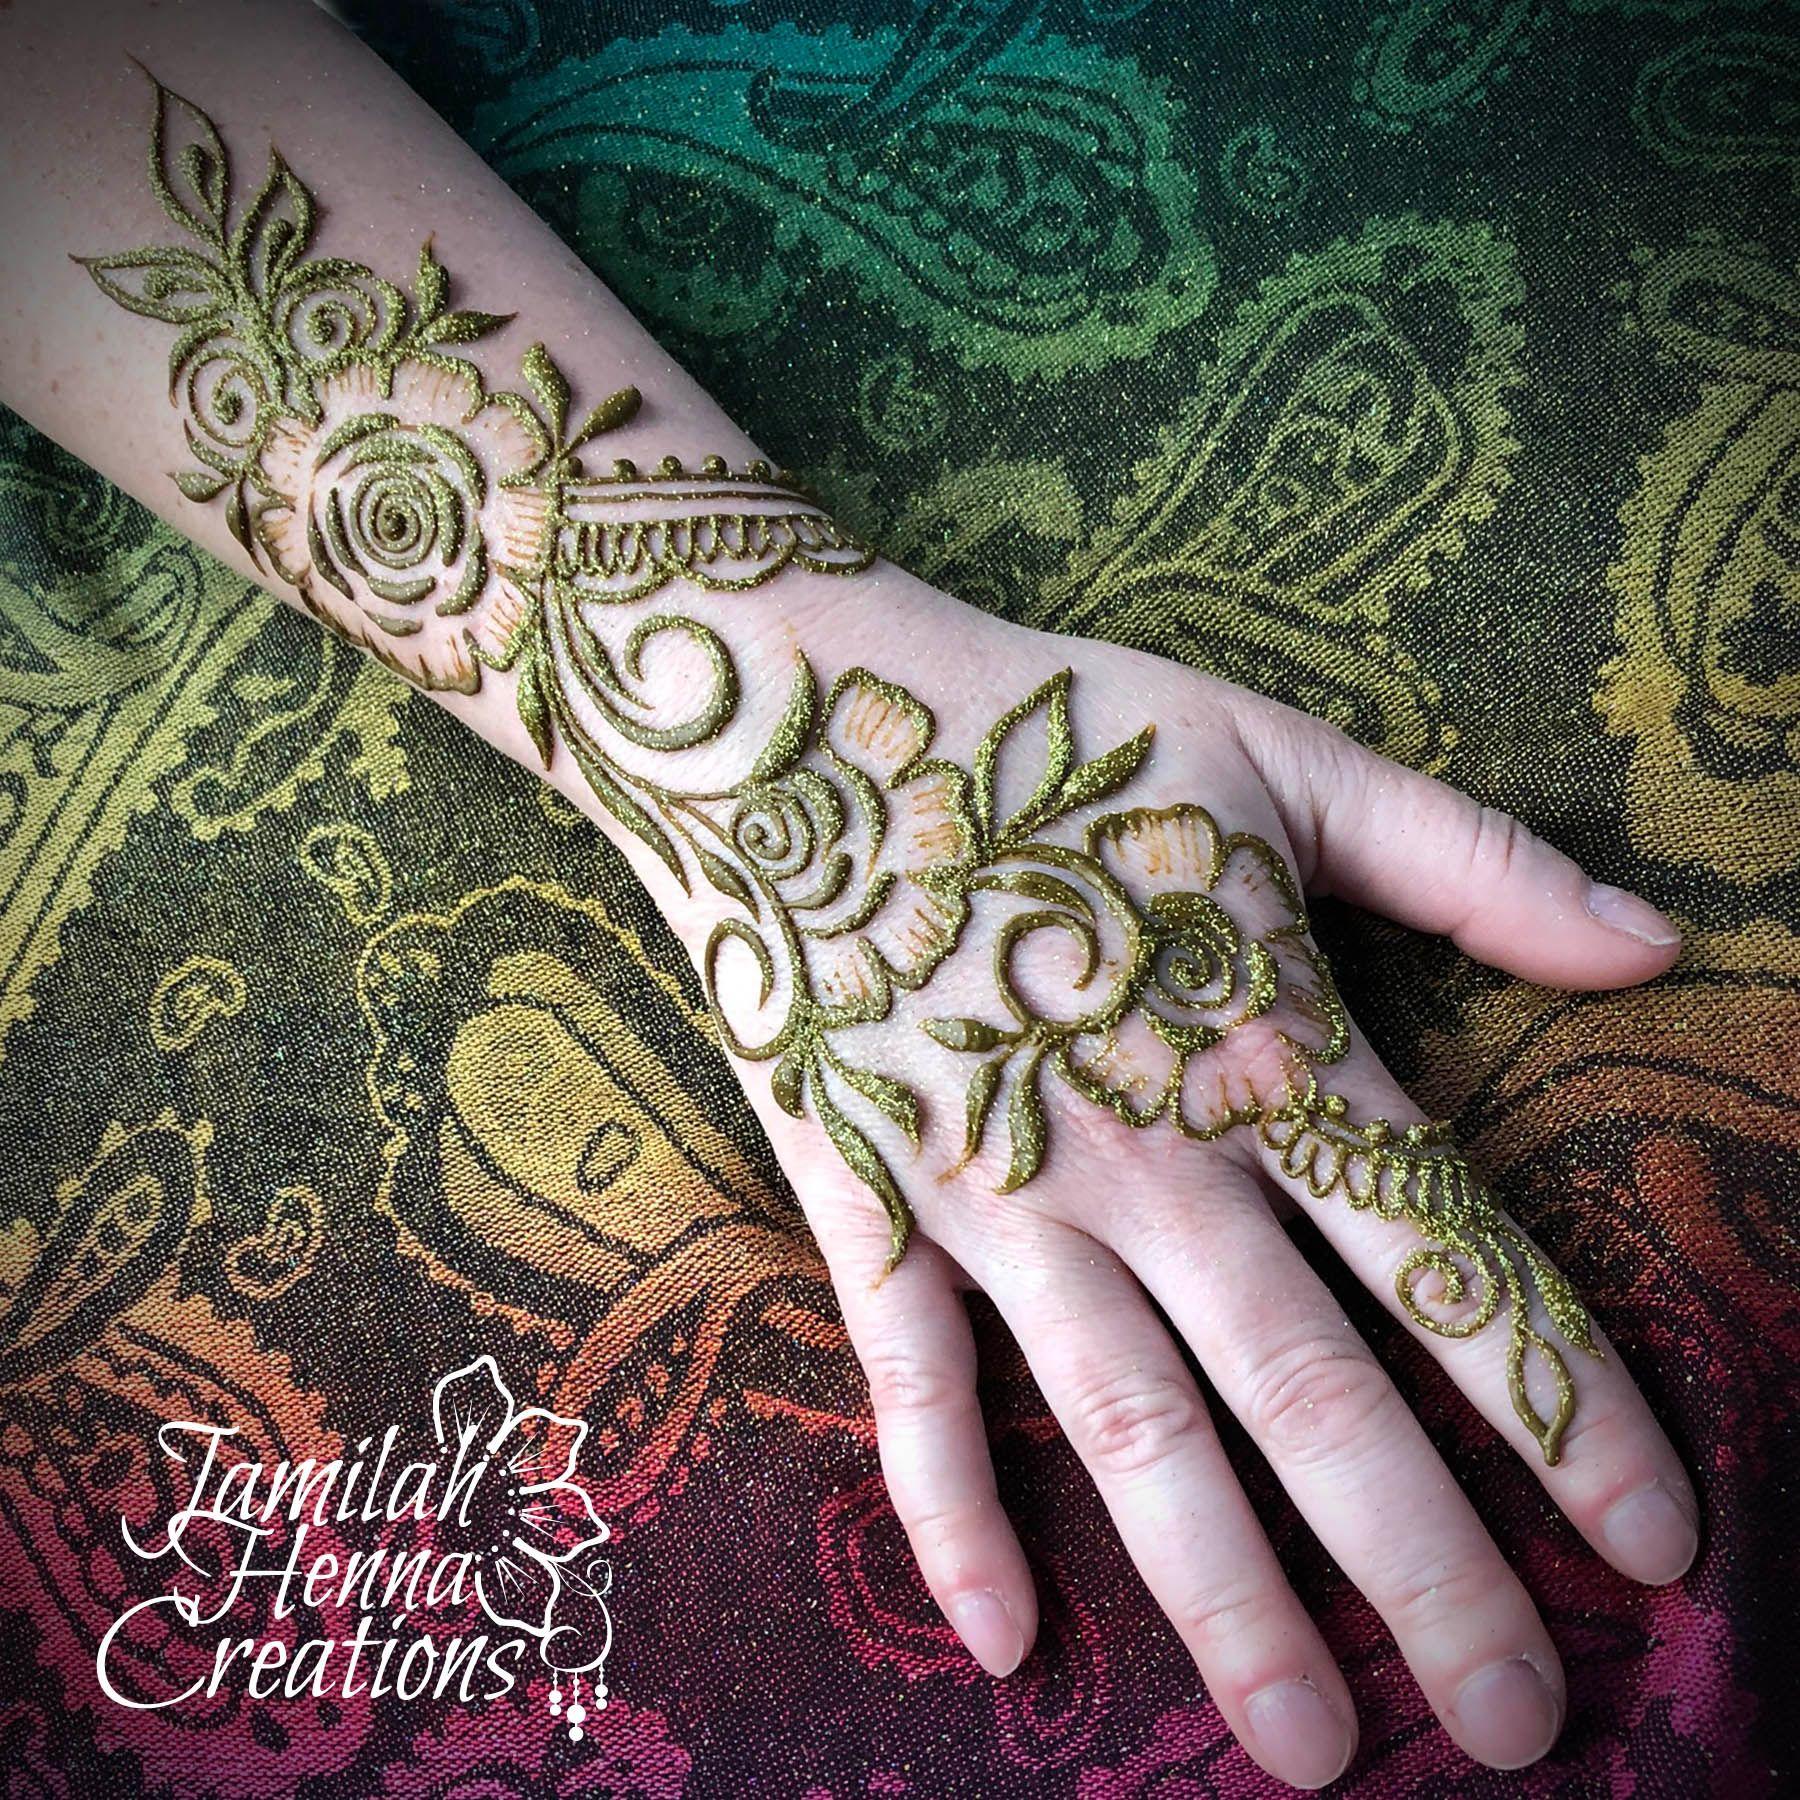 Artist Choice Henna For My High School Friend Class Of 1990 Yes I M Old Www Jamilahhennacreations Com He New Mehndi Designs Mehndi Designs Henna